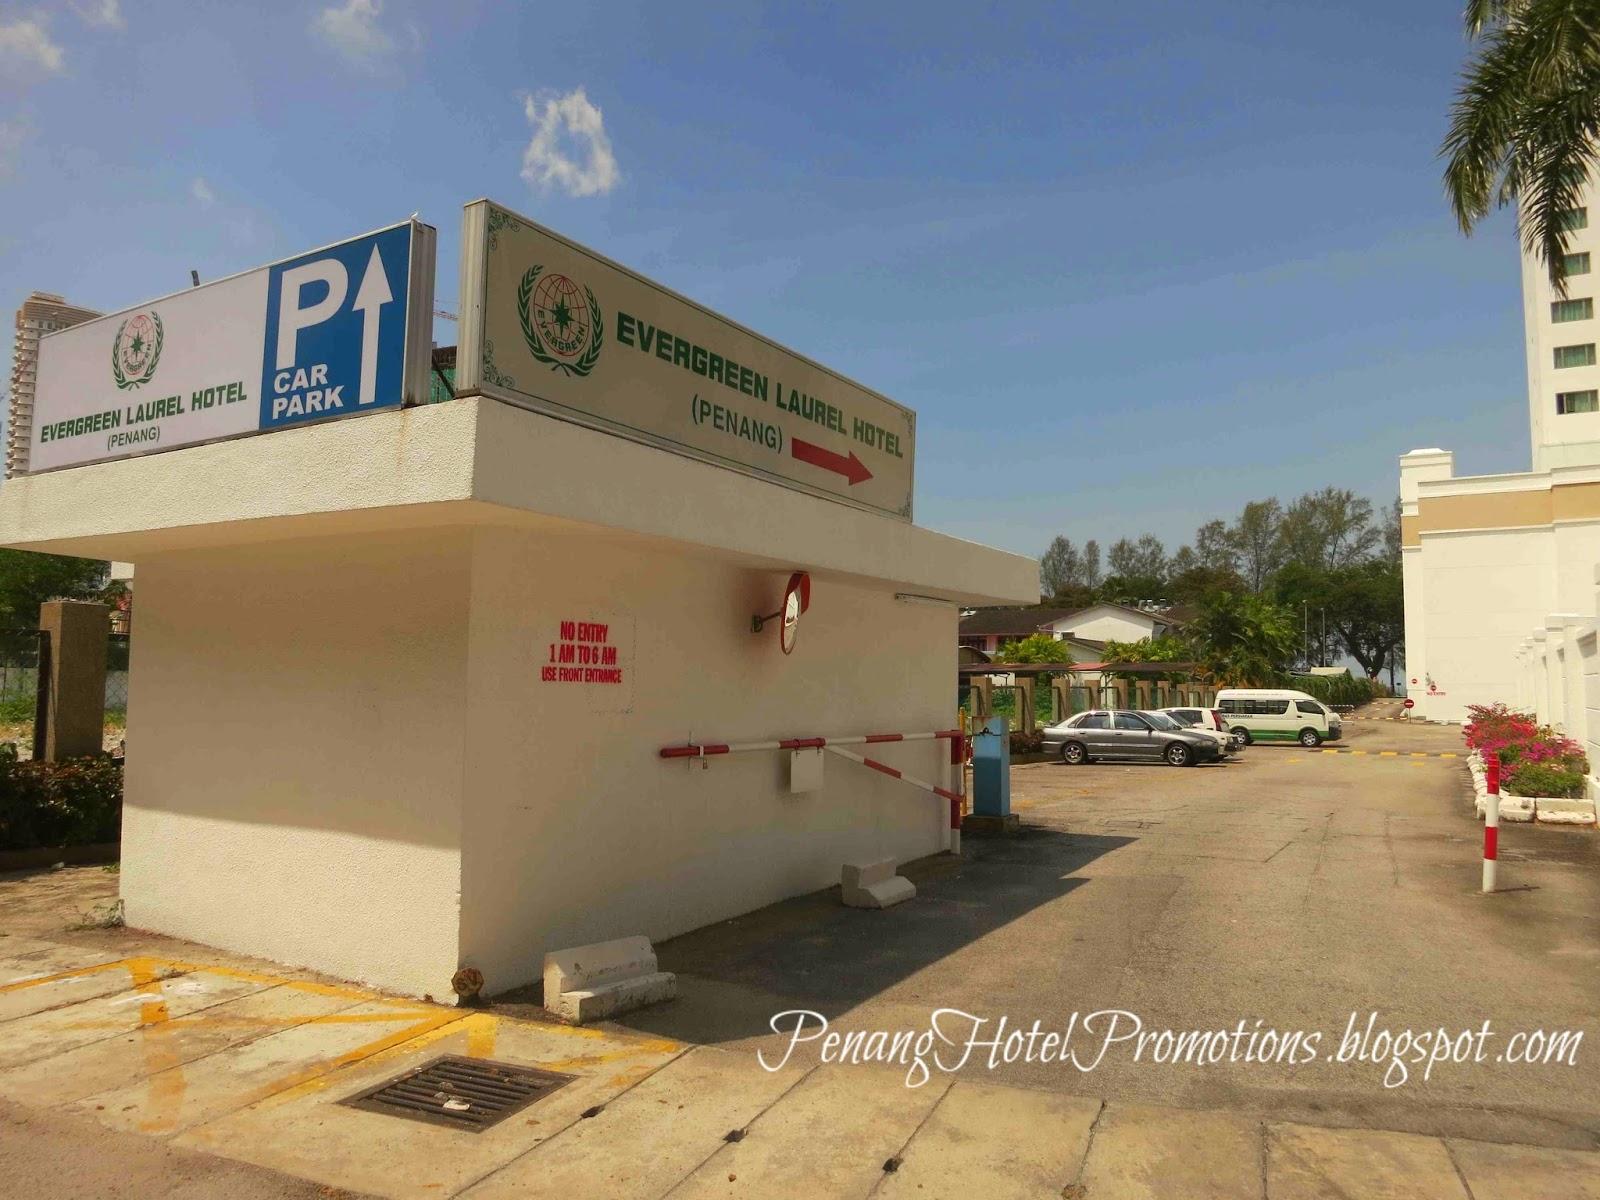 Penang Hotel Promotions: Evergreen Laurel Hotel Penang - Weekend ...